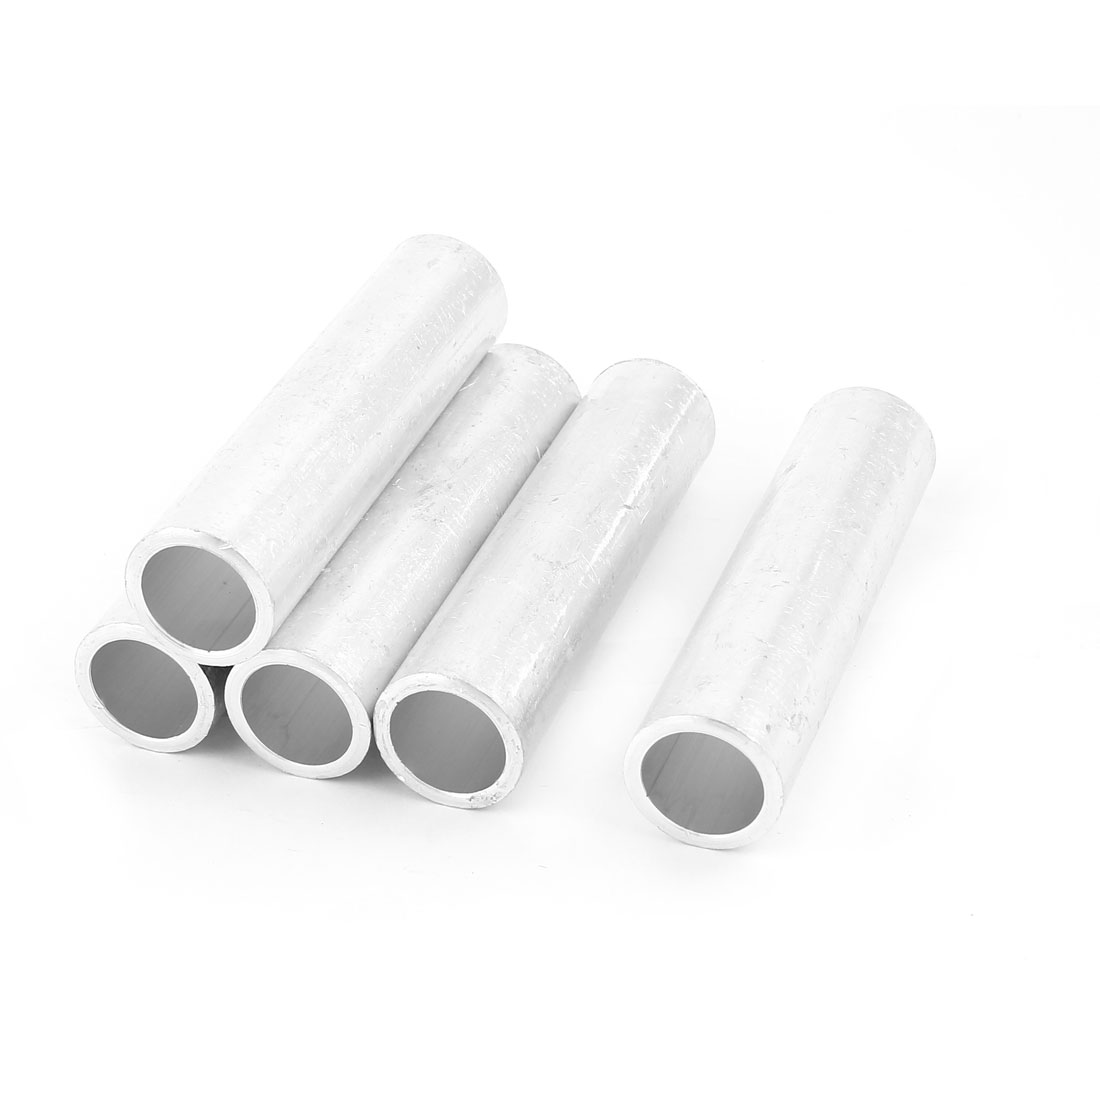 5Pcs Aluminium Tubular Inline Straight Connector Joints 18mm Inner Dia 96mm Long